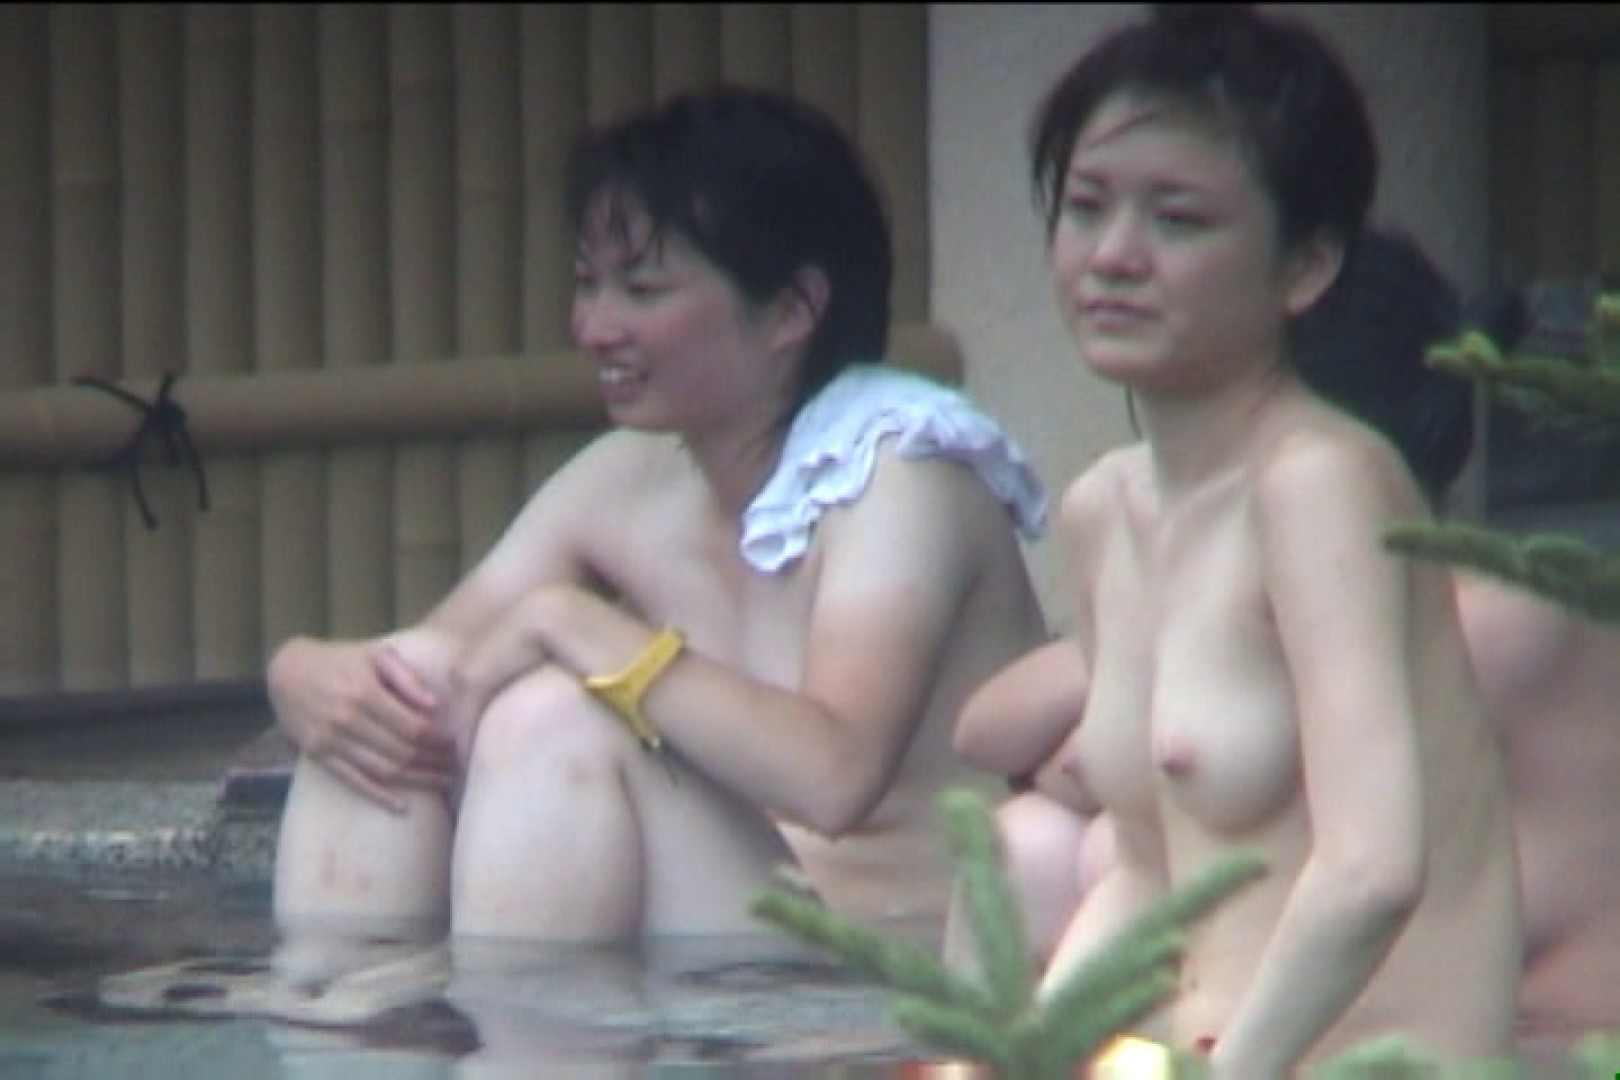 Aquaな露天風呂Vol.94【VIP限定】 盗撮シリーズ | 露天風呂編  111PIX 35